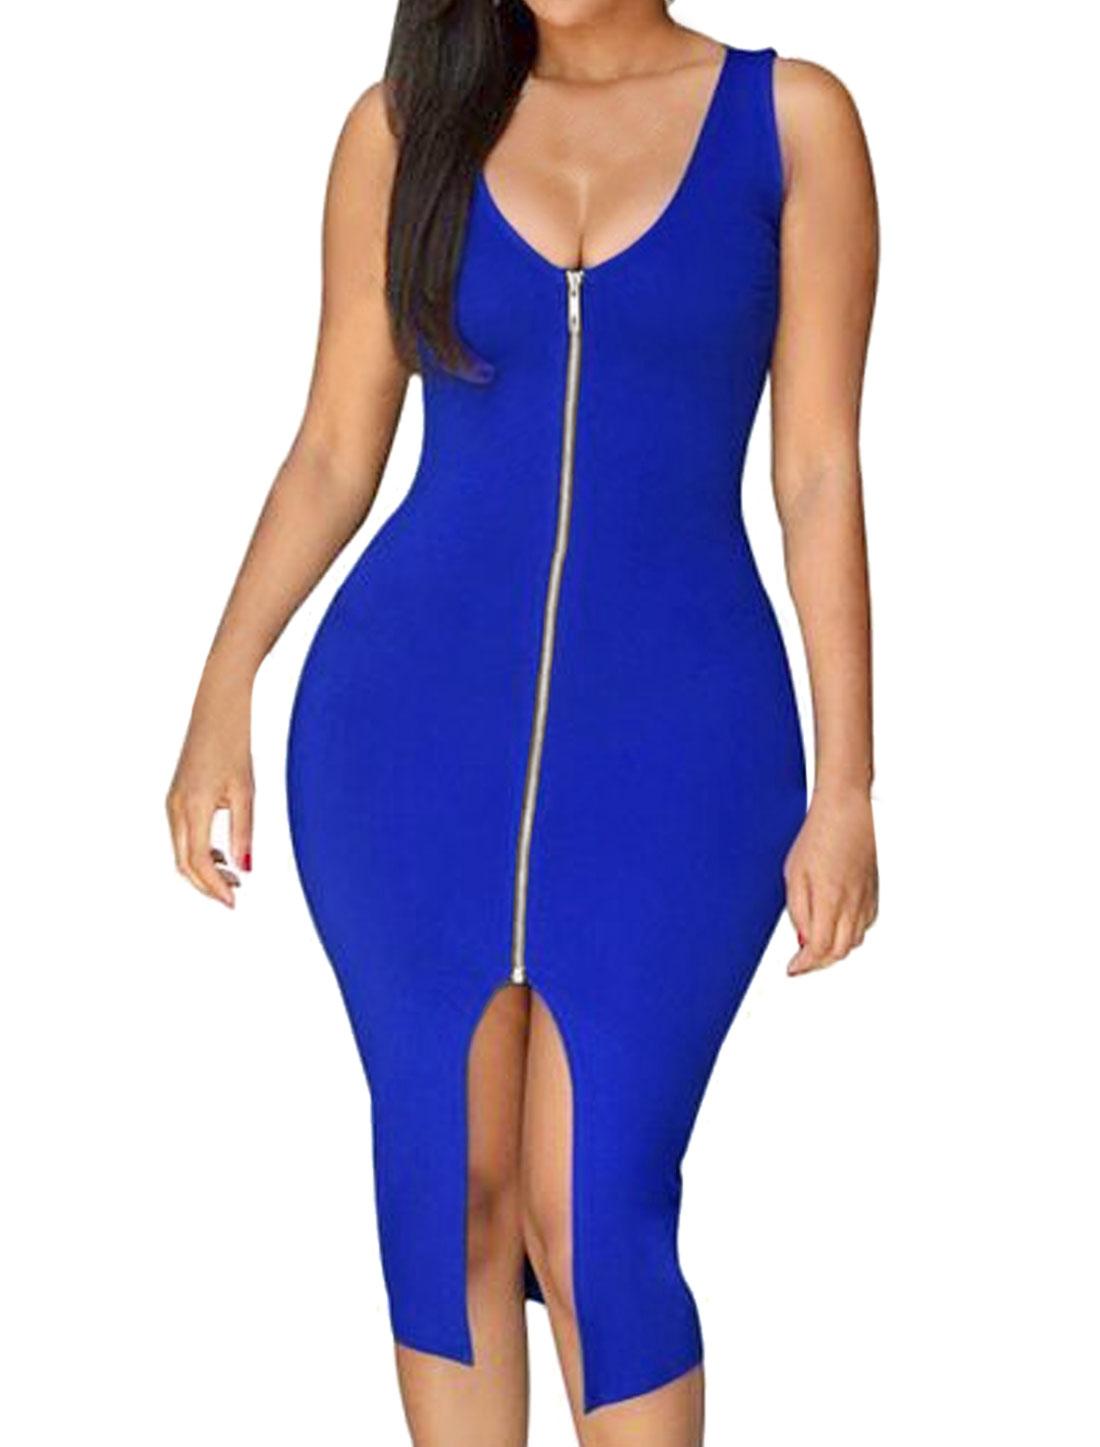 Lady Sleeveless Scoop Neck Exposed Zipper Split Front Bodycon Dress Blue L